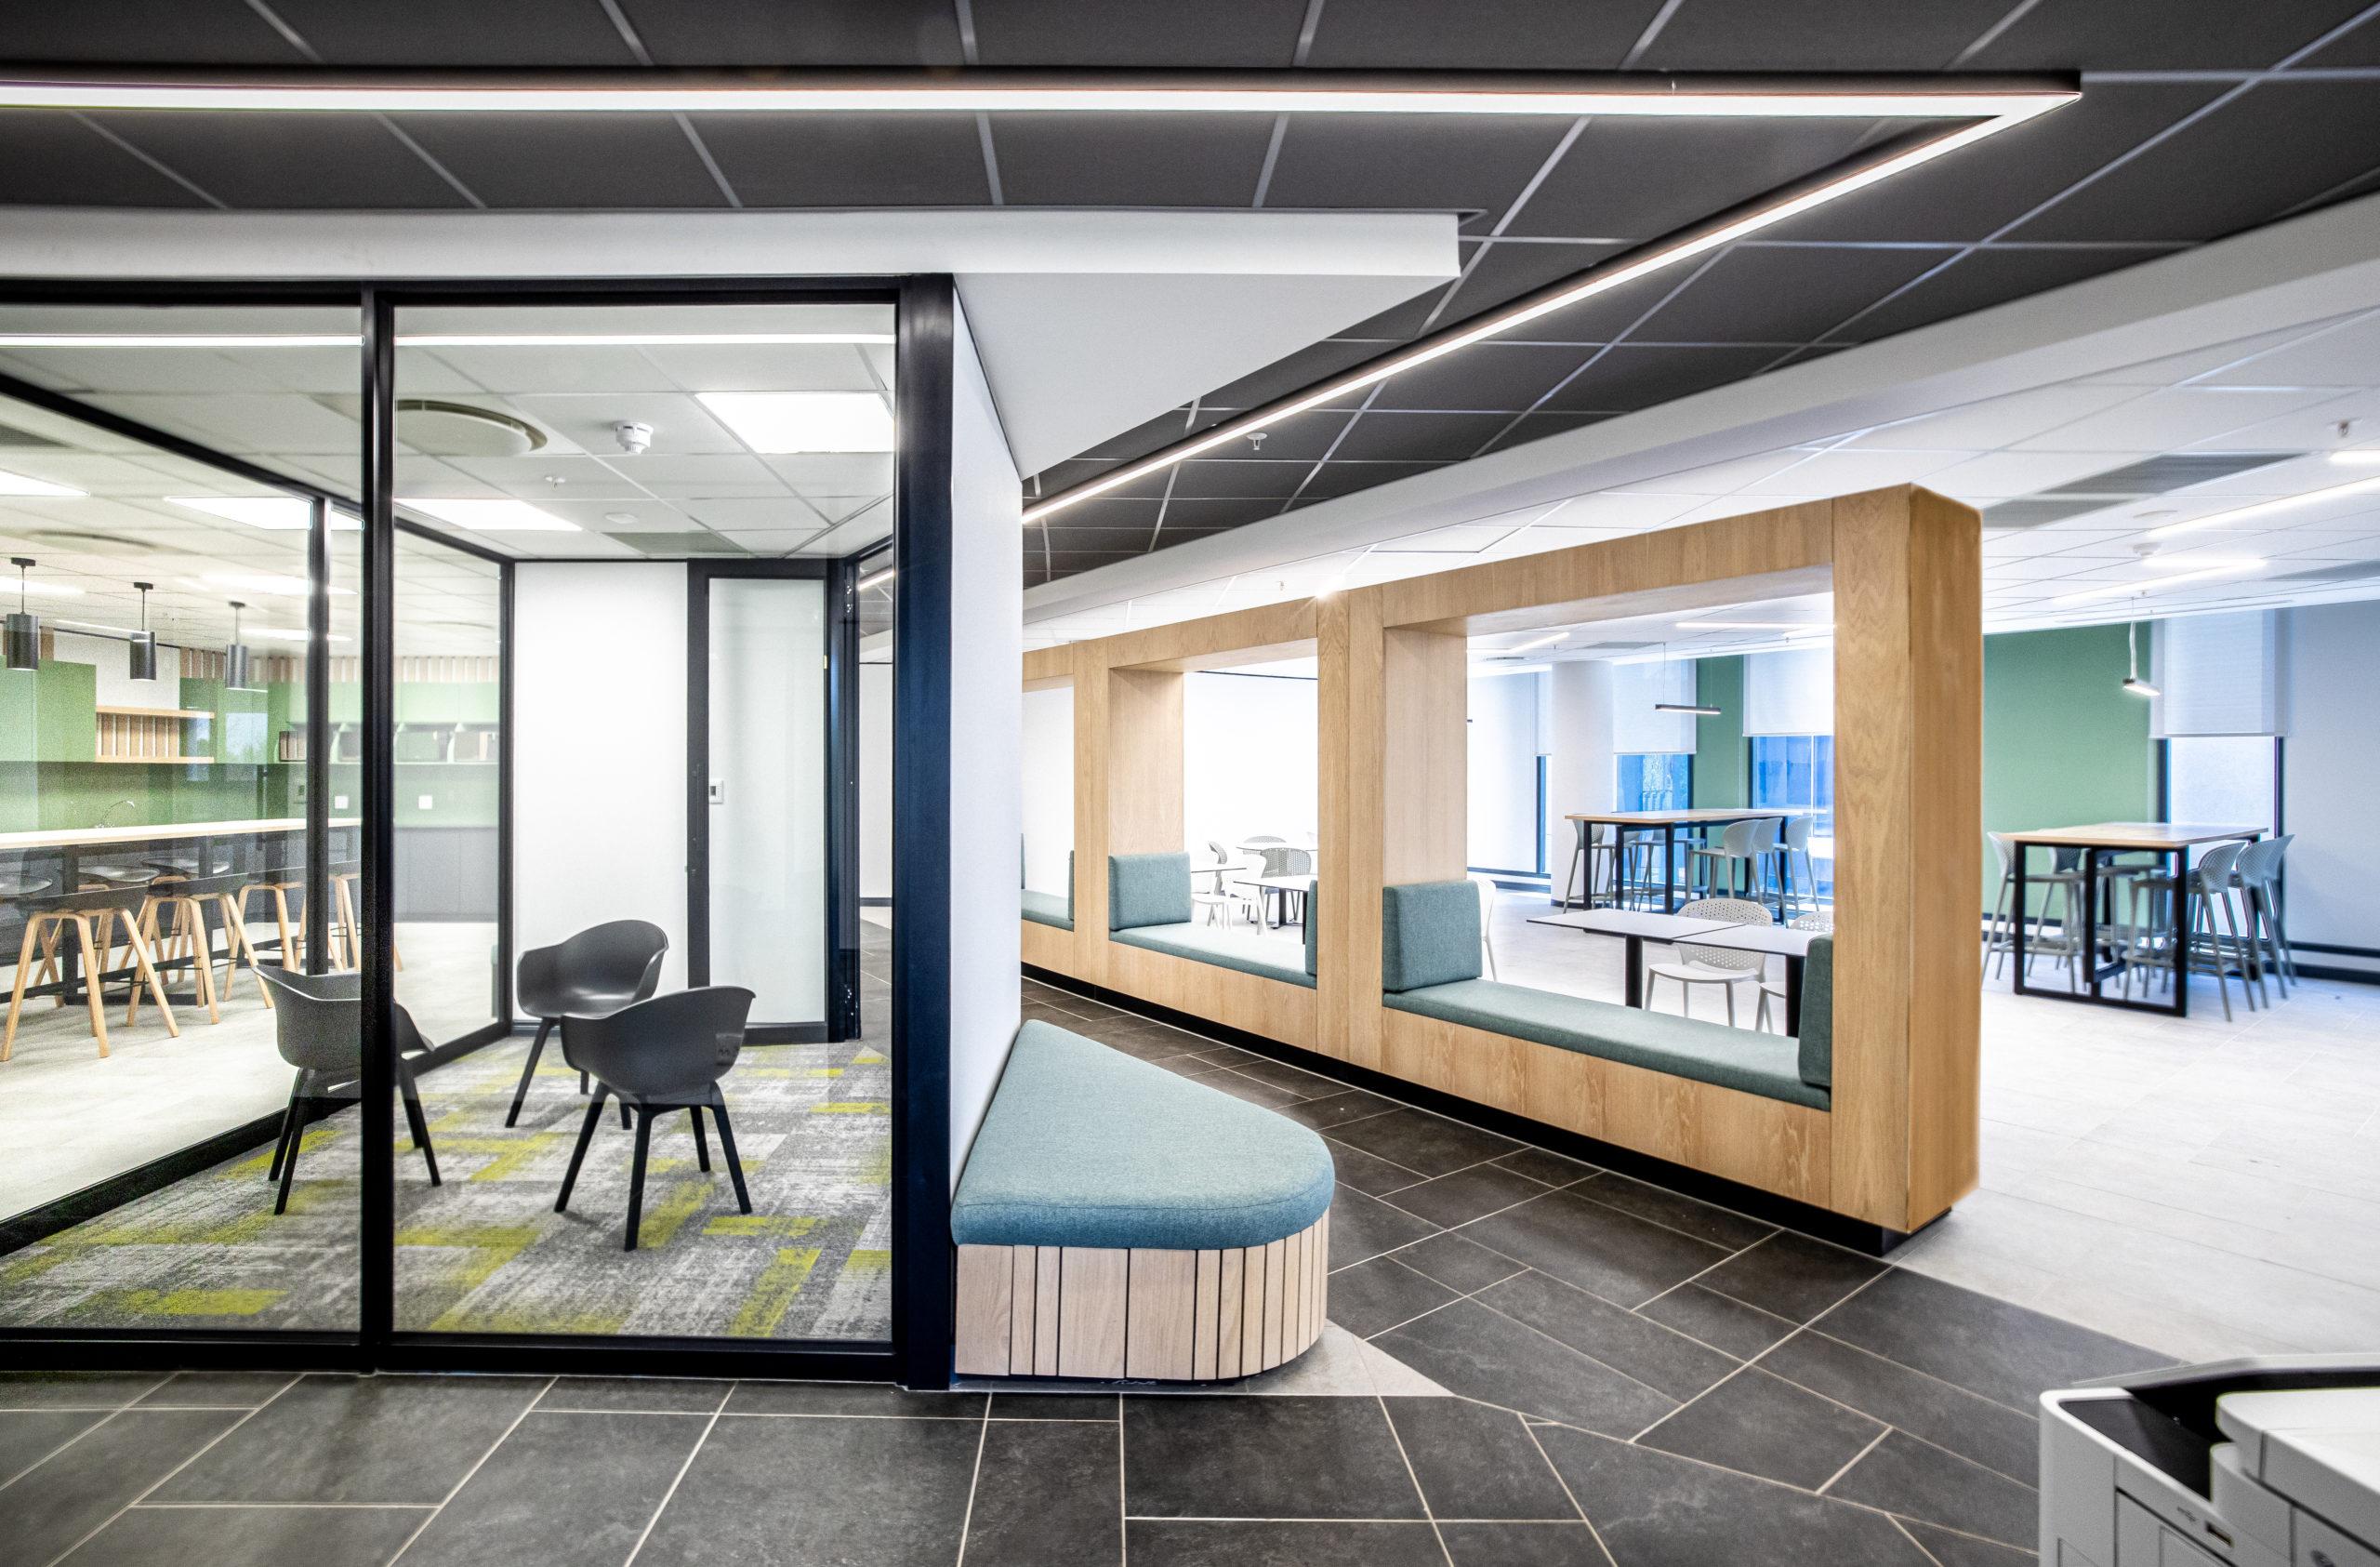 Life Healthcare - Turnkey Interiors - Corporate Interior Design and Build